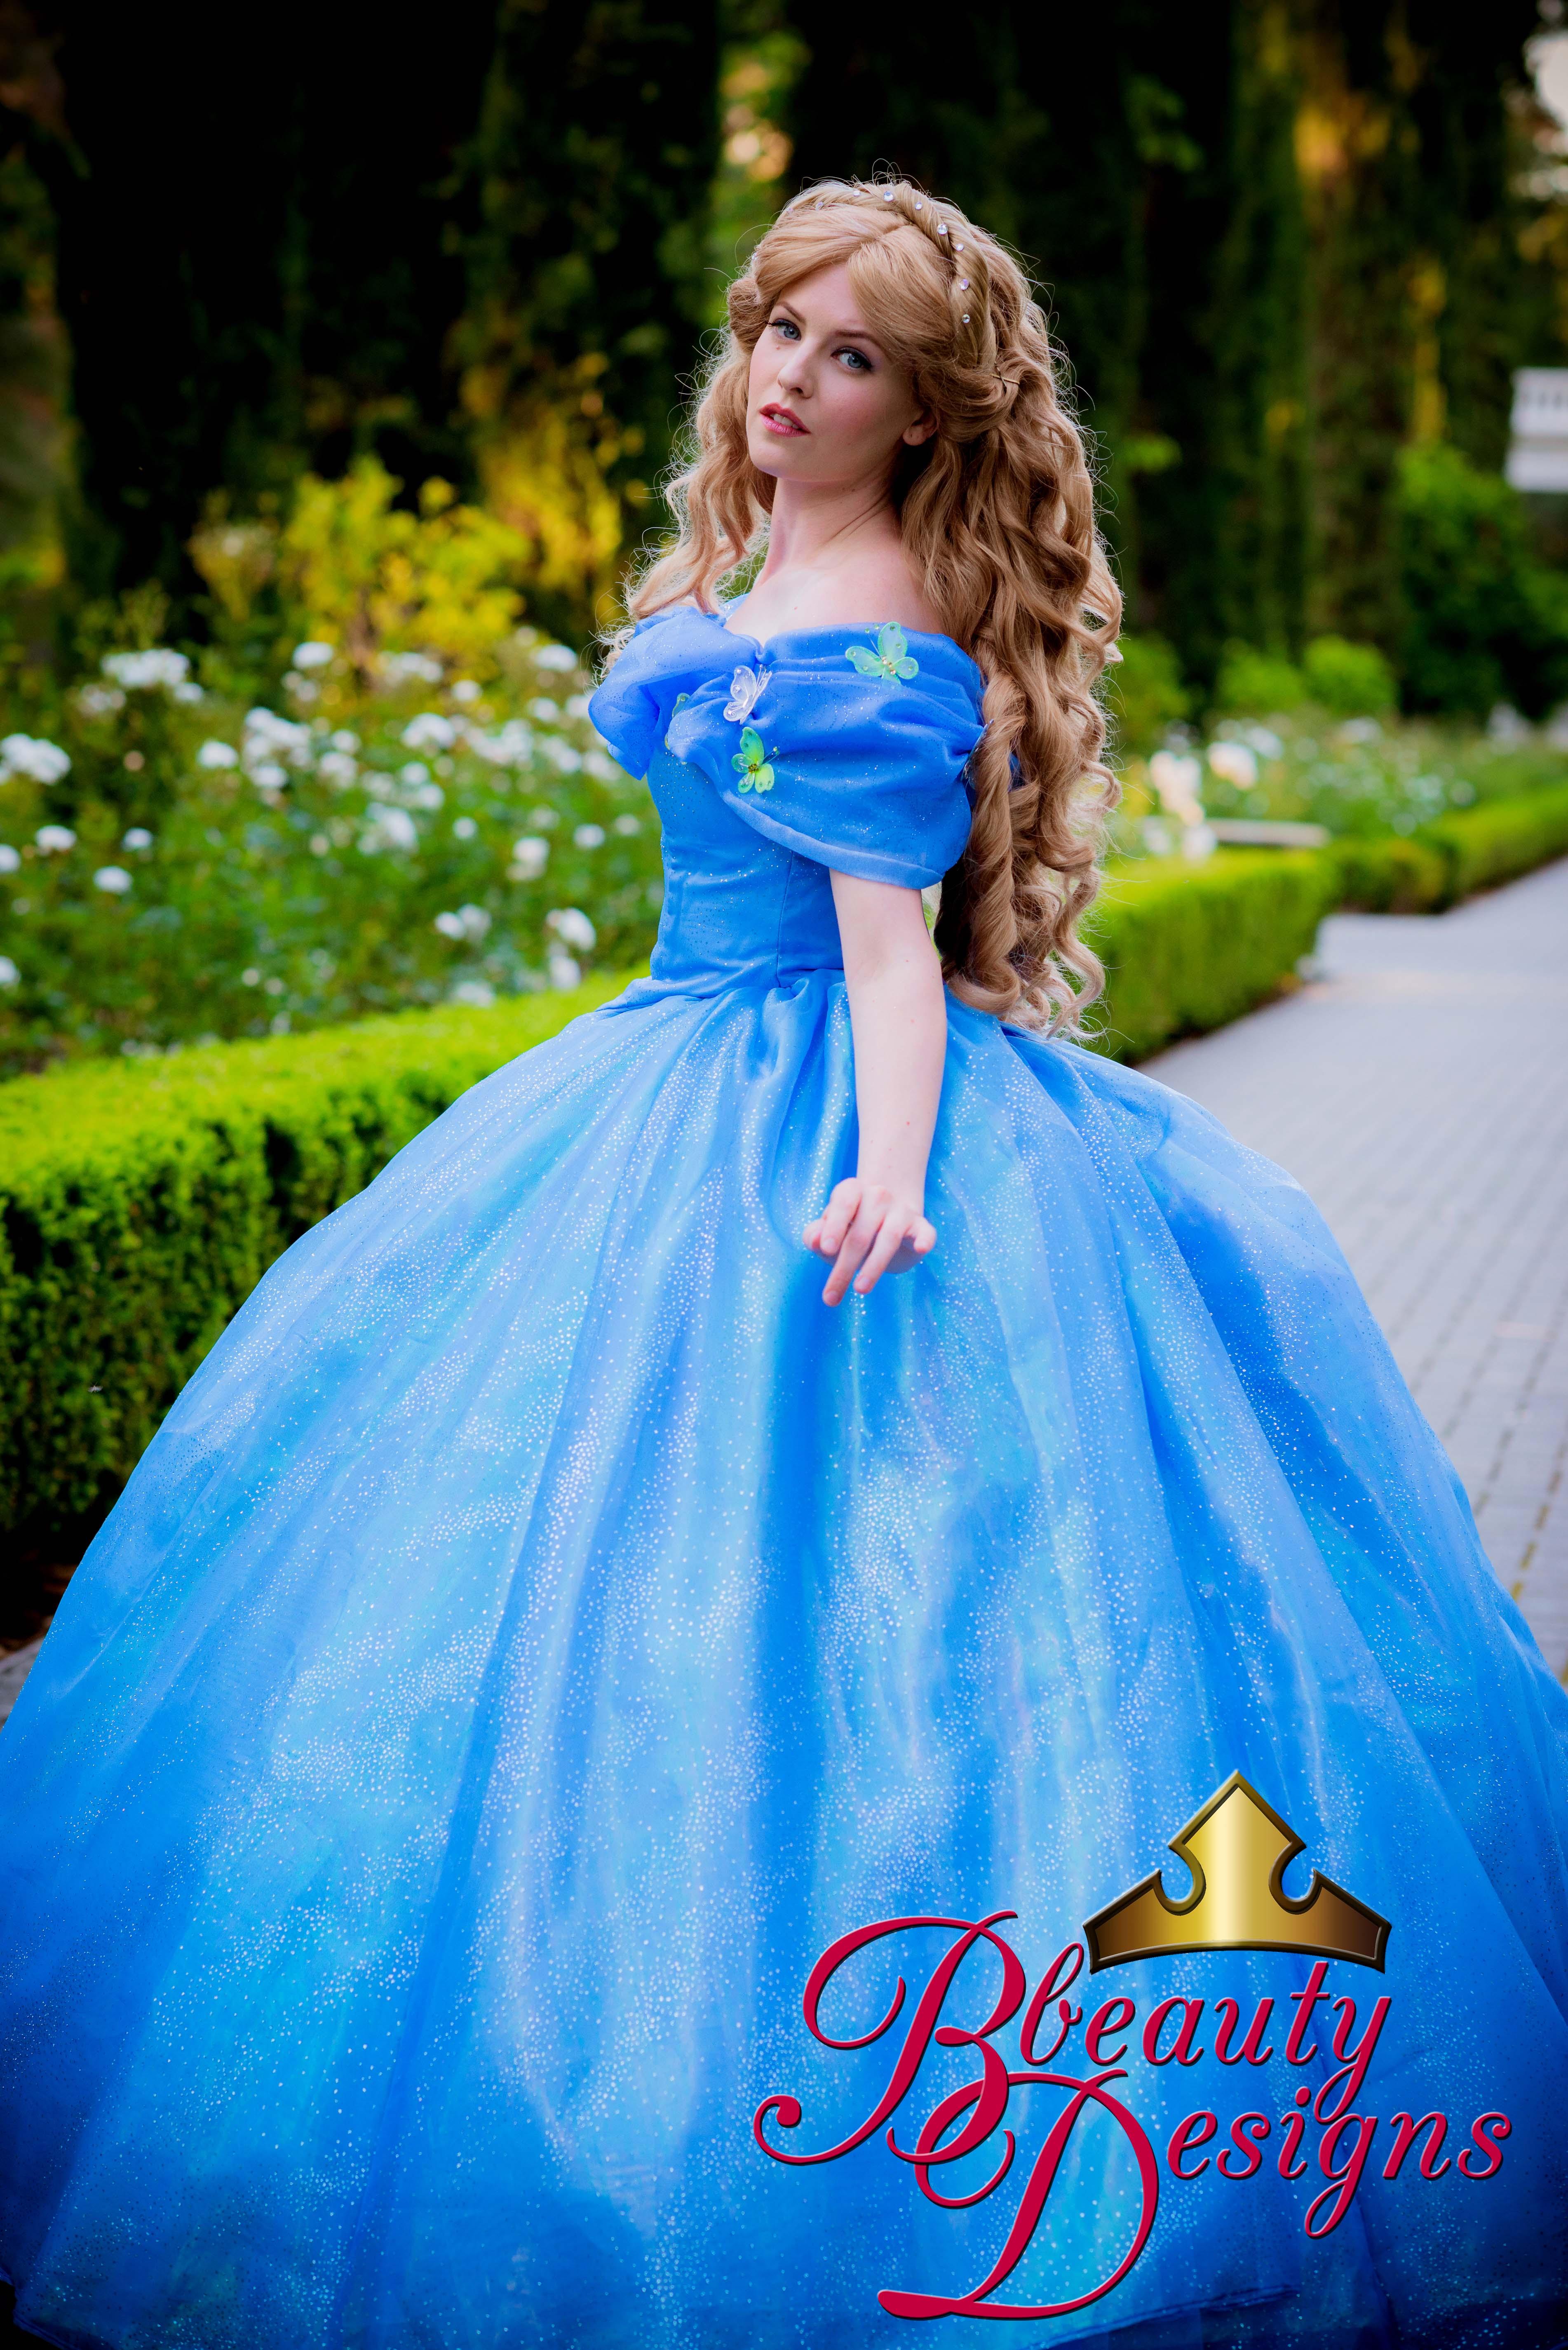 Cinderella 2015 Angle watermark.jpg